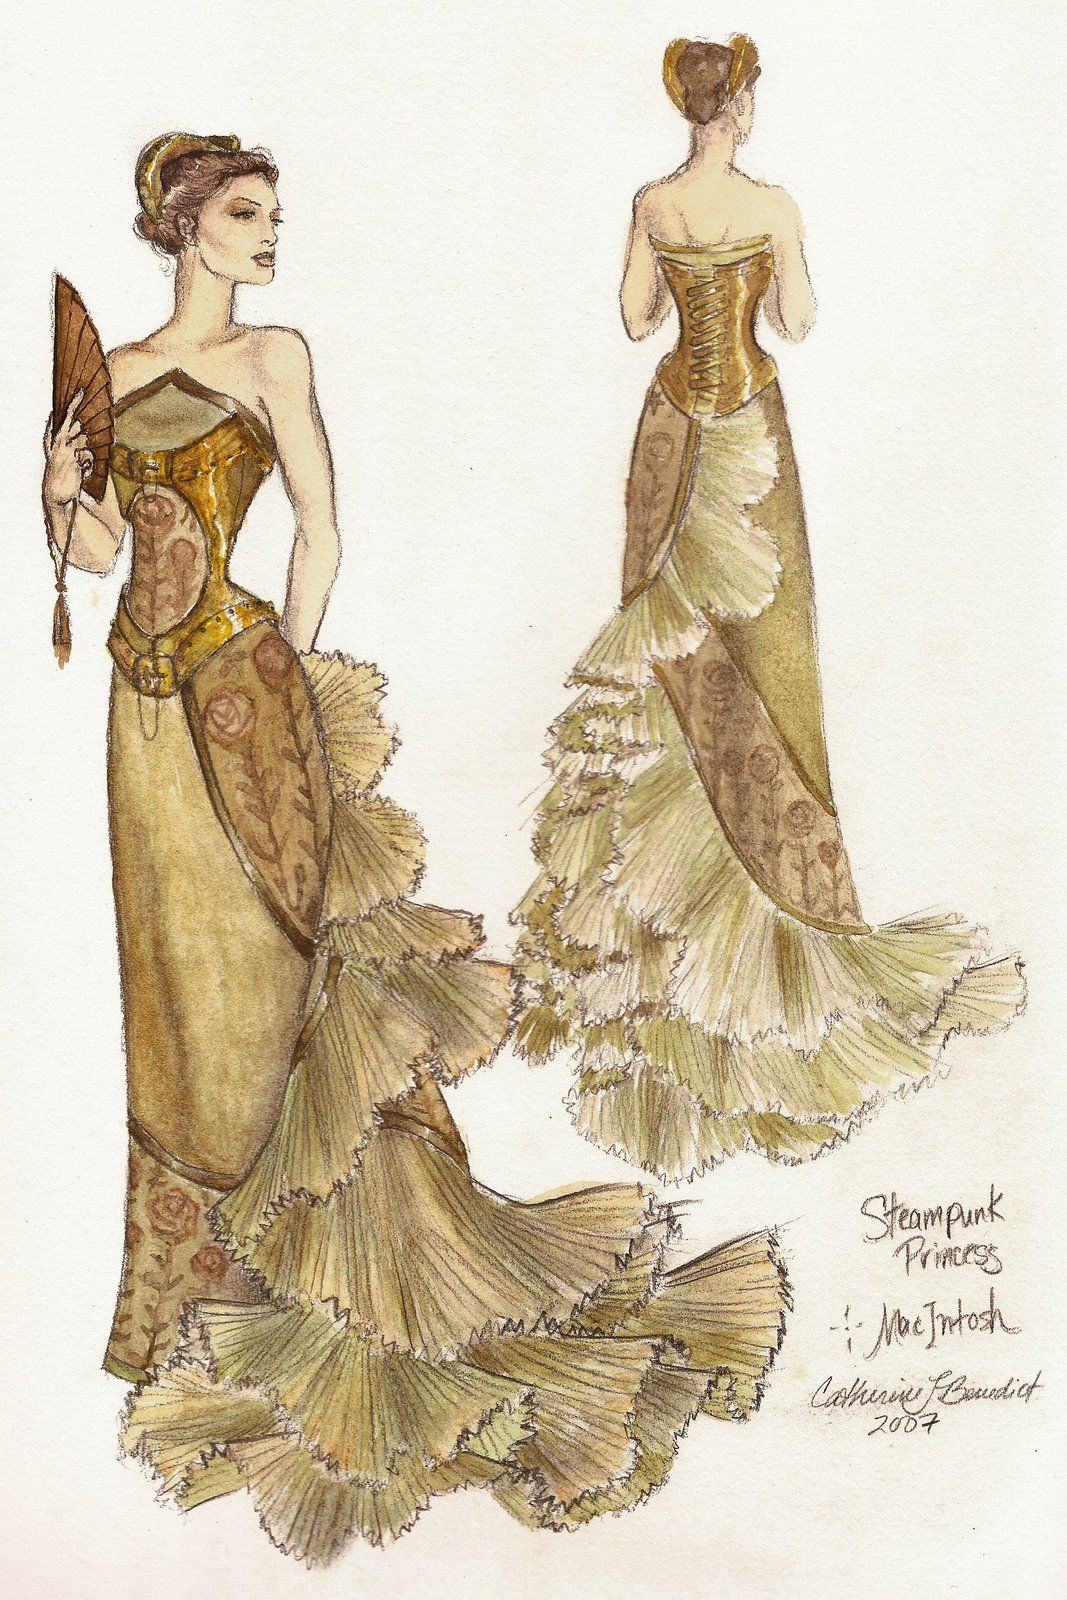 Steampunk Princess Ballgown - by fashion artist Catherine Benedict.  Beautiful!